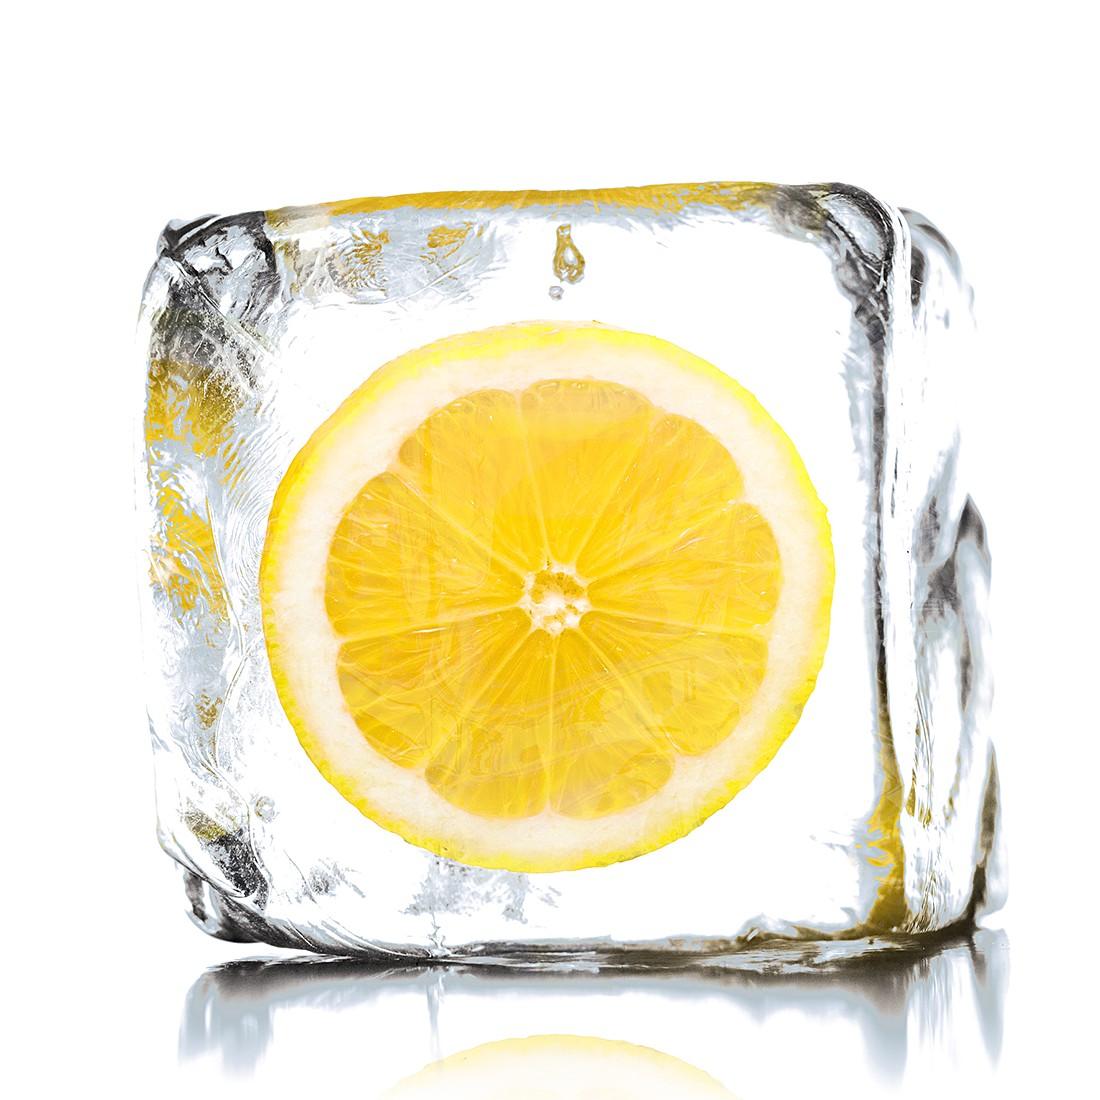 Afbeelding achter glas Lemon Ice print achter glas, Pro Art